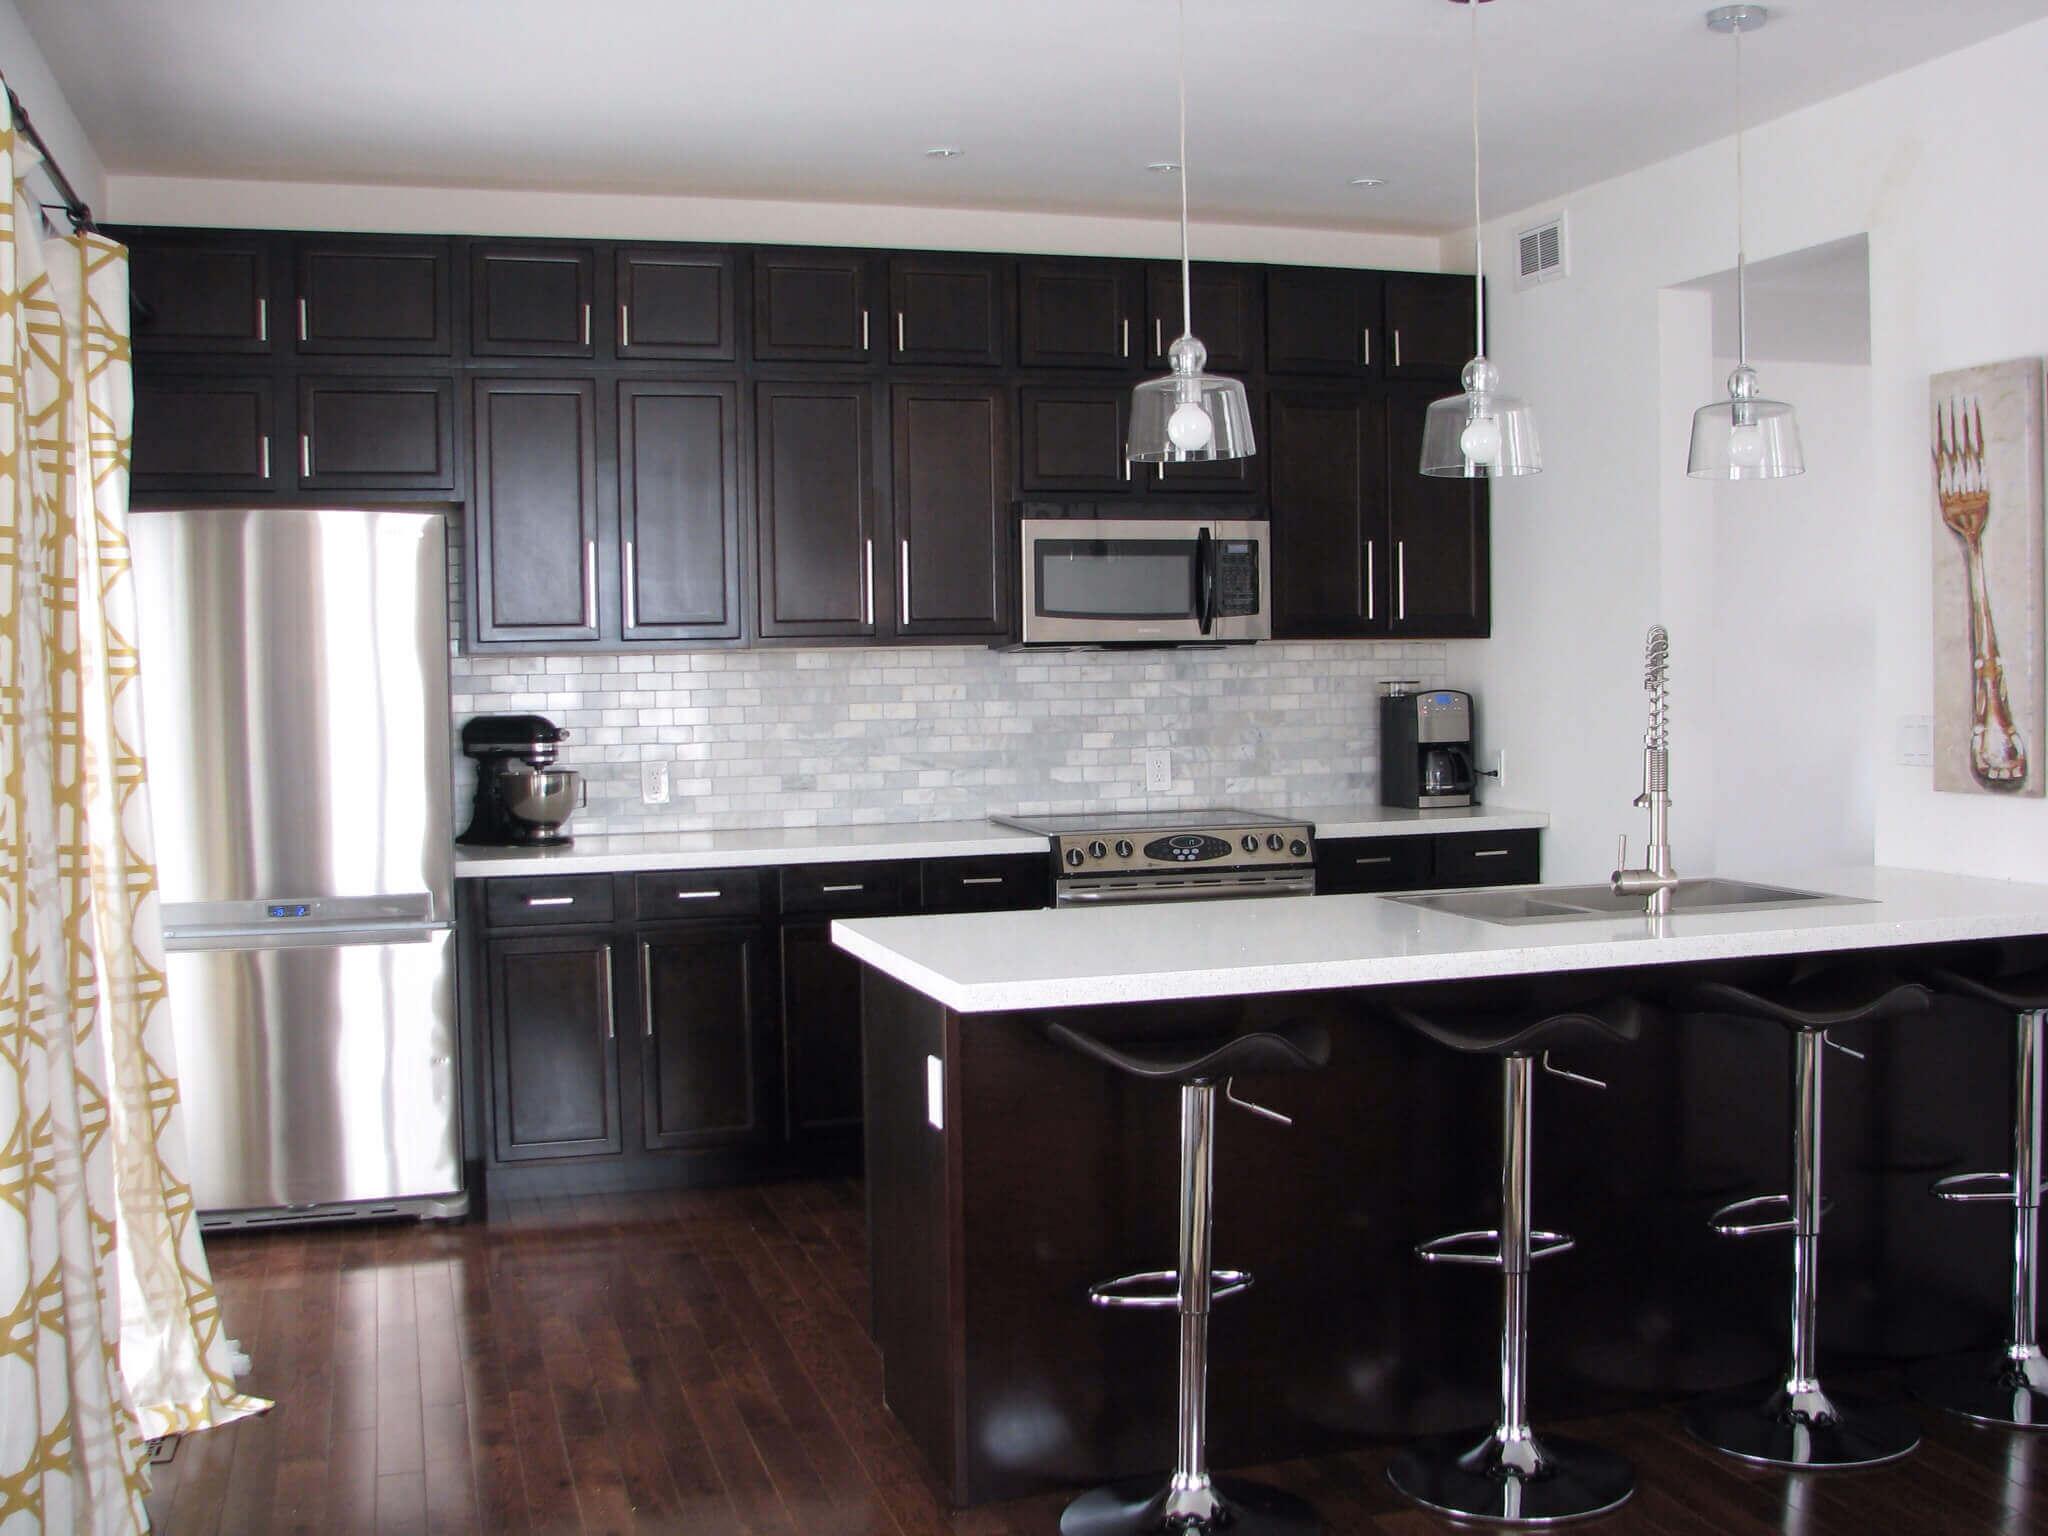 78+ Great Looking Modern Kitchen Gallery | Sinks, Islands ...